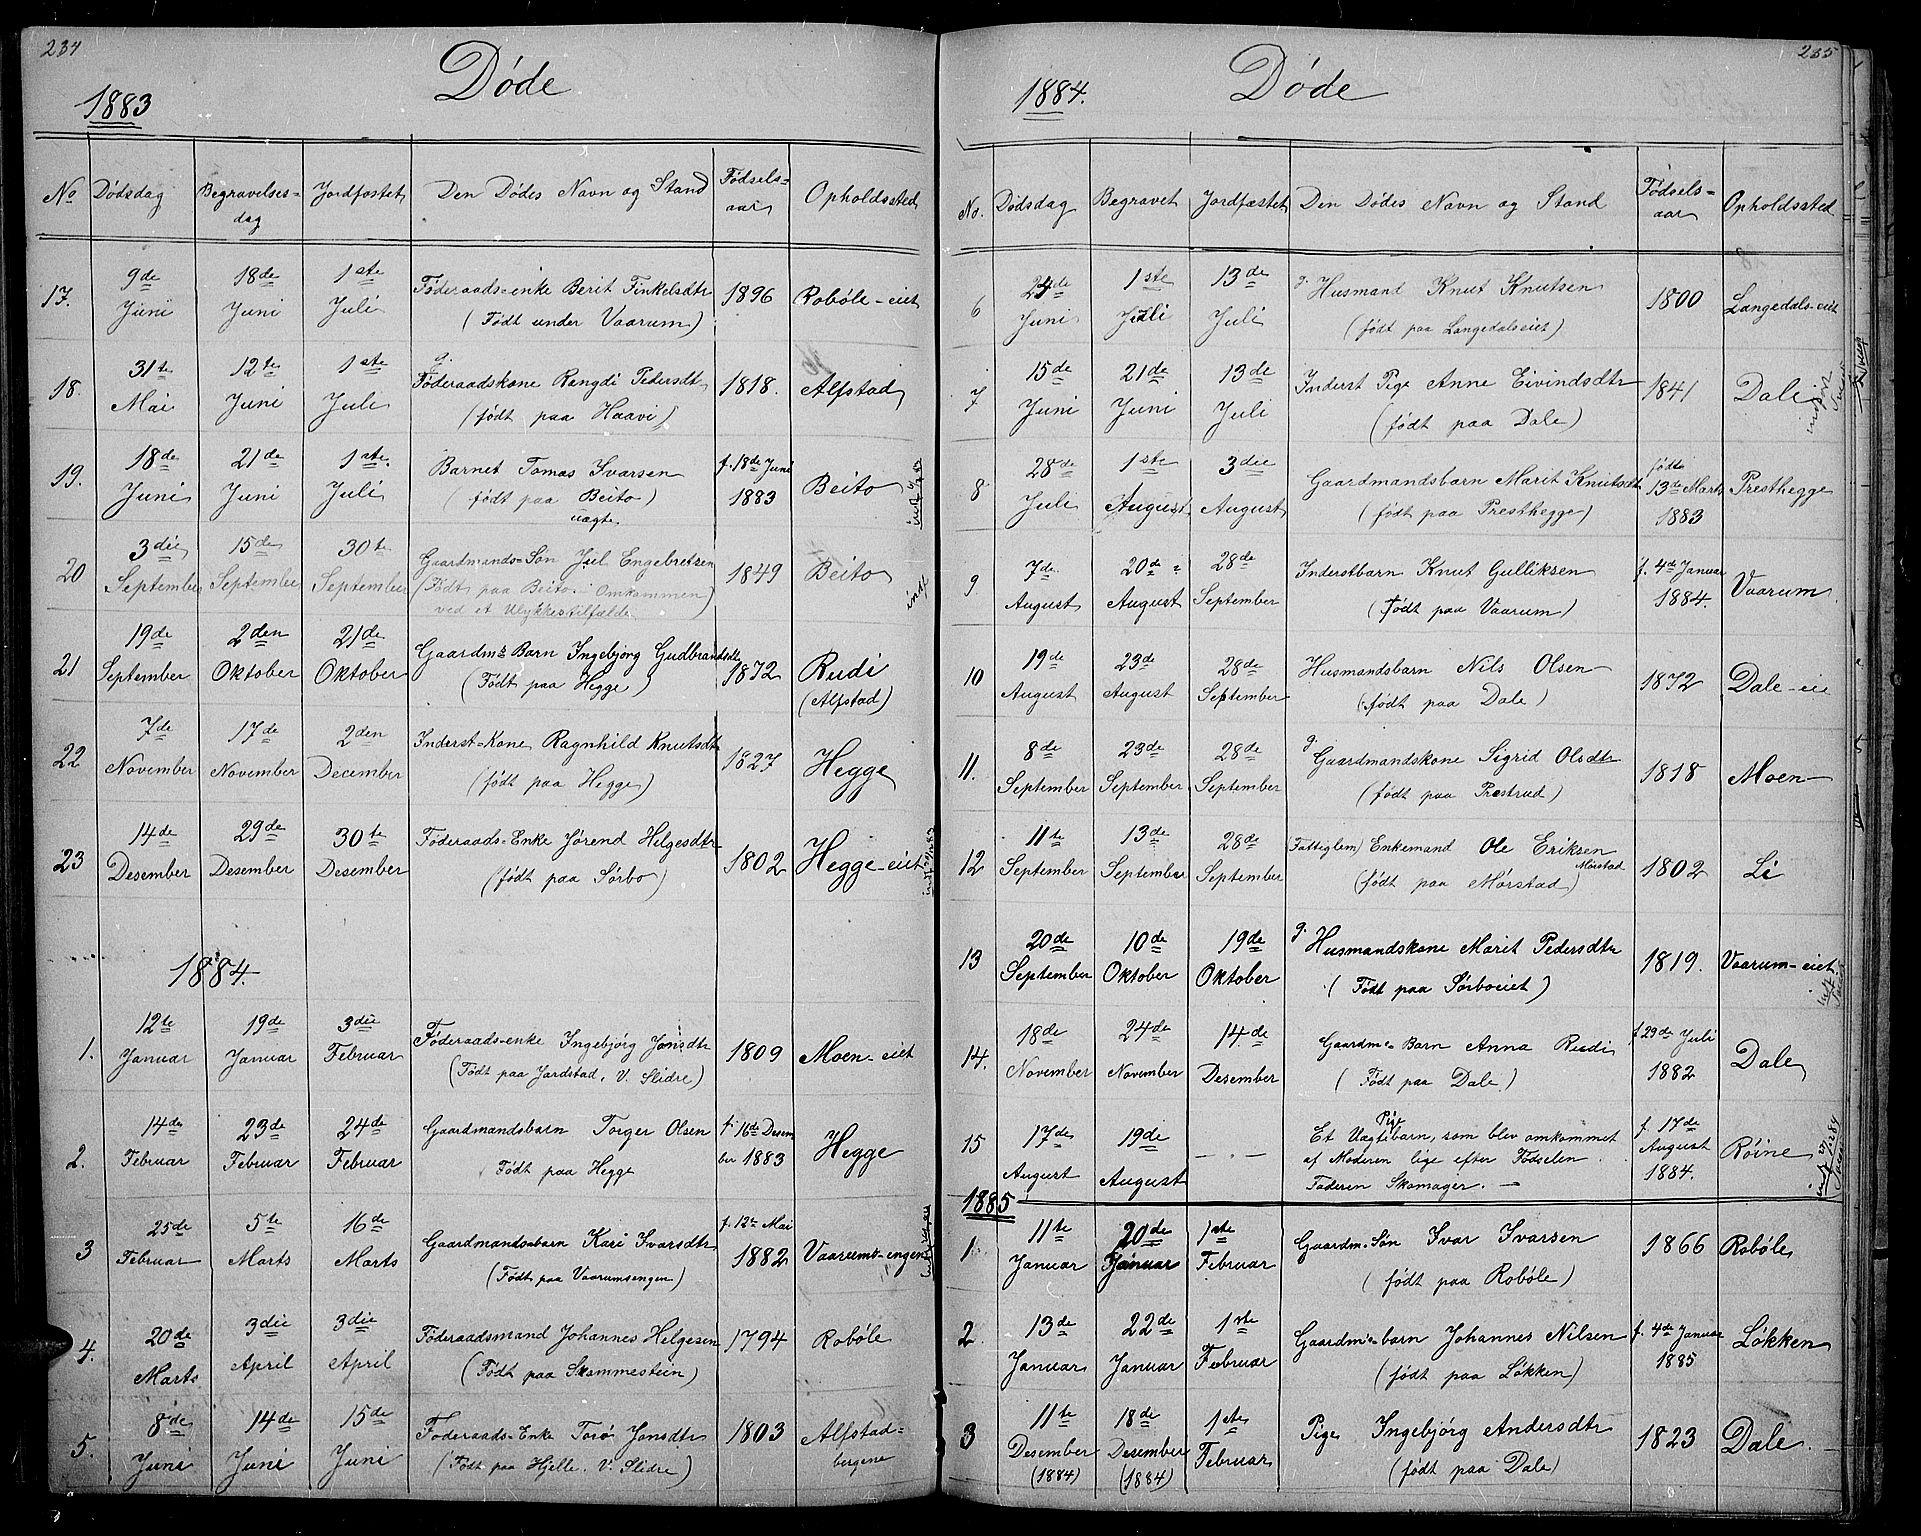 SAH, Øystre Slidre prestekontor, Klokkerbok nr. 1, 1866-1886, s. 234-235